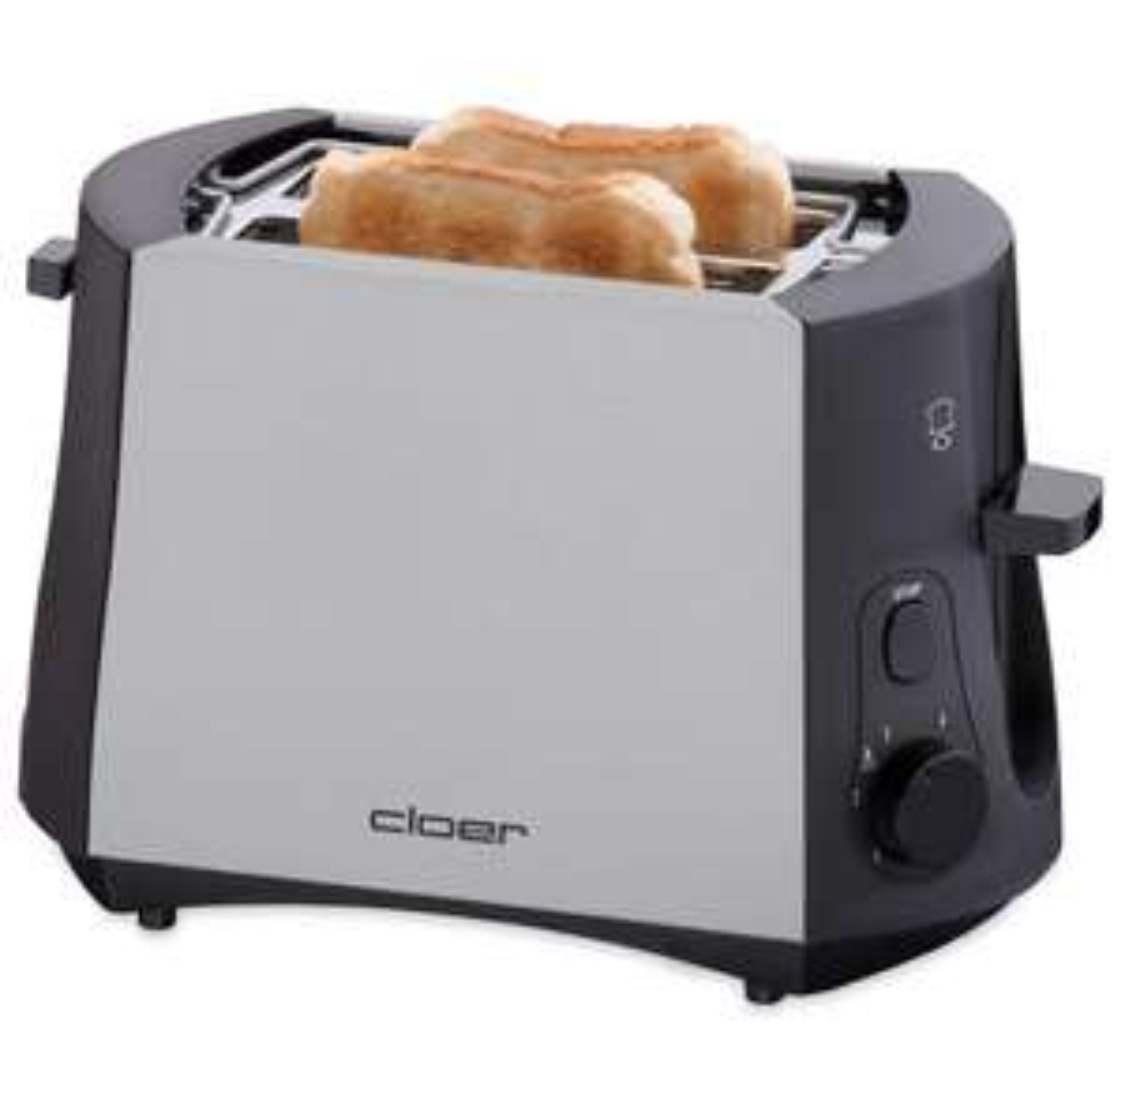 Cloer 3410 Toaster zum Top Preis